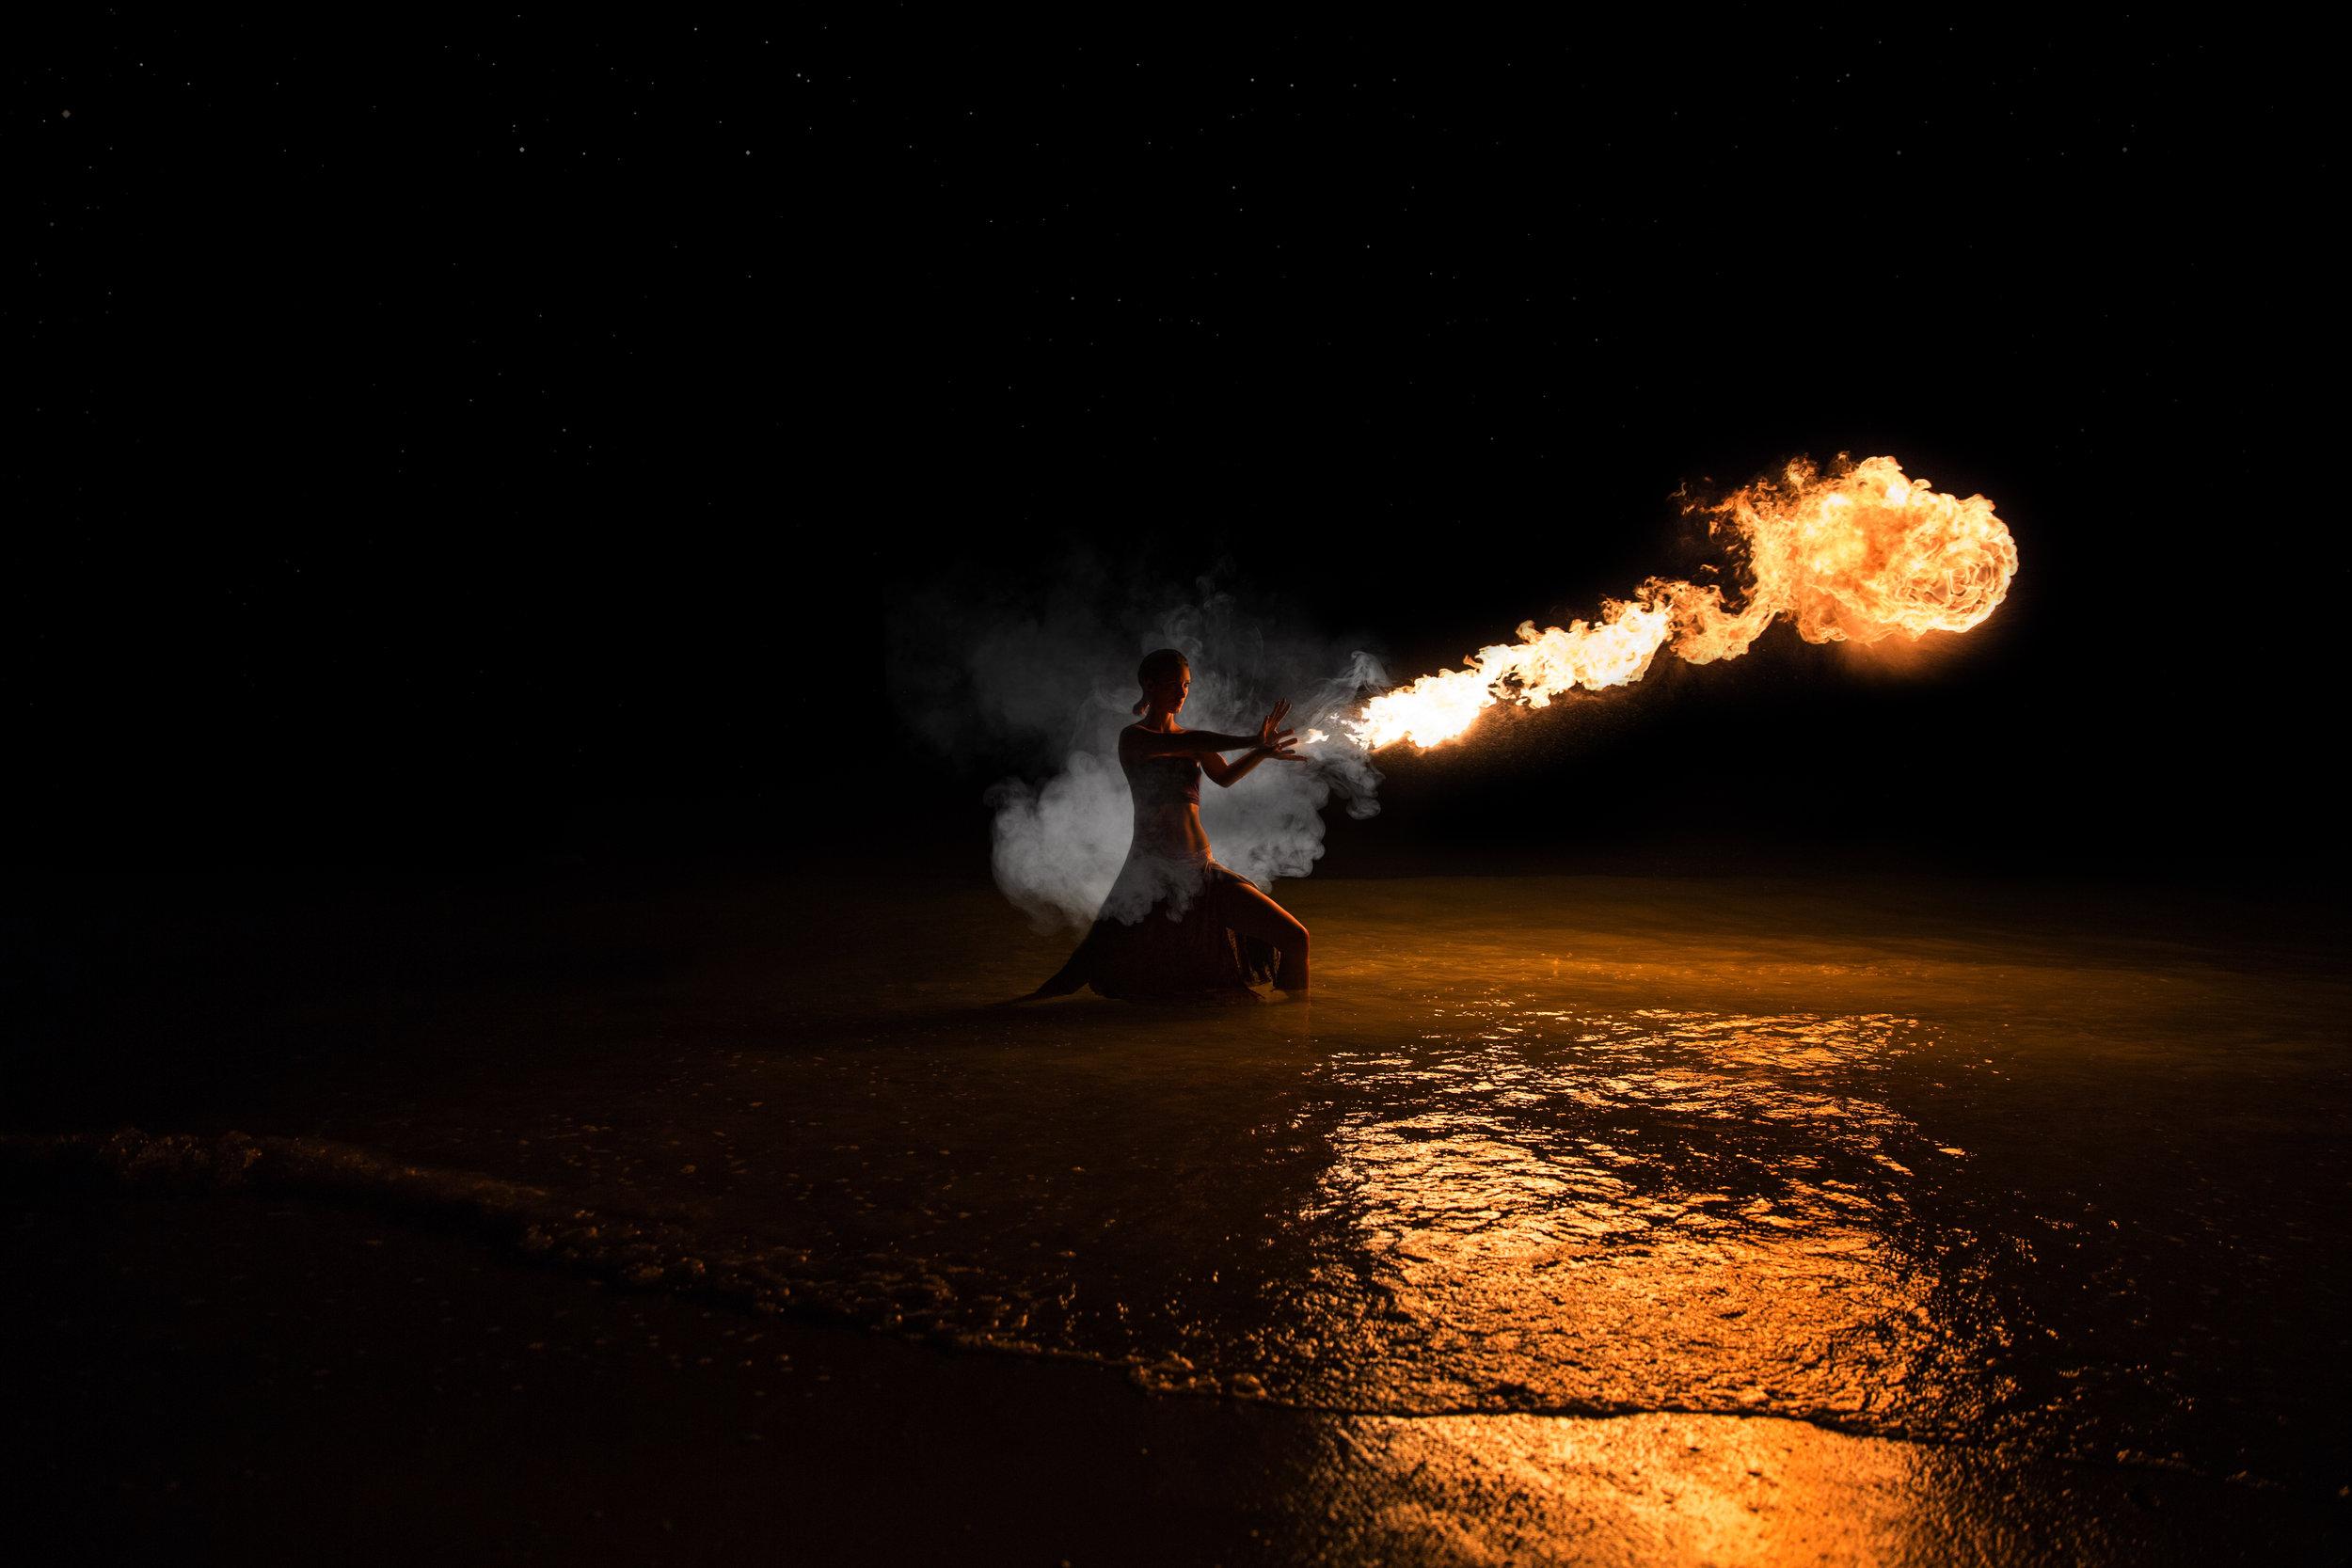 Madi-Austin-Fire-Painting-2100-fire-edit-2.jpg